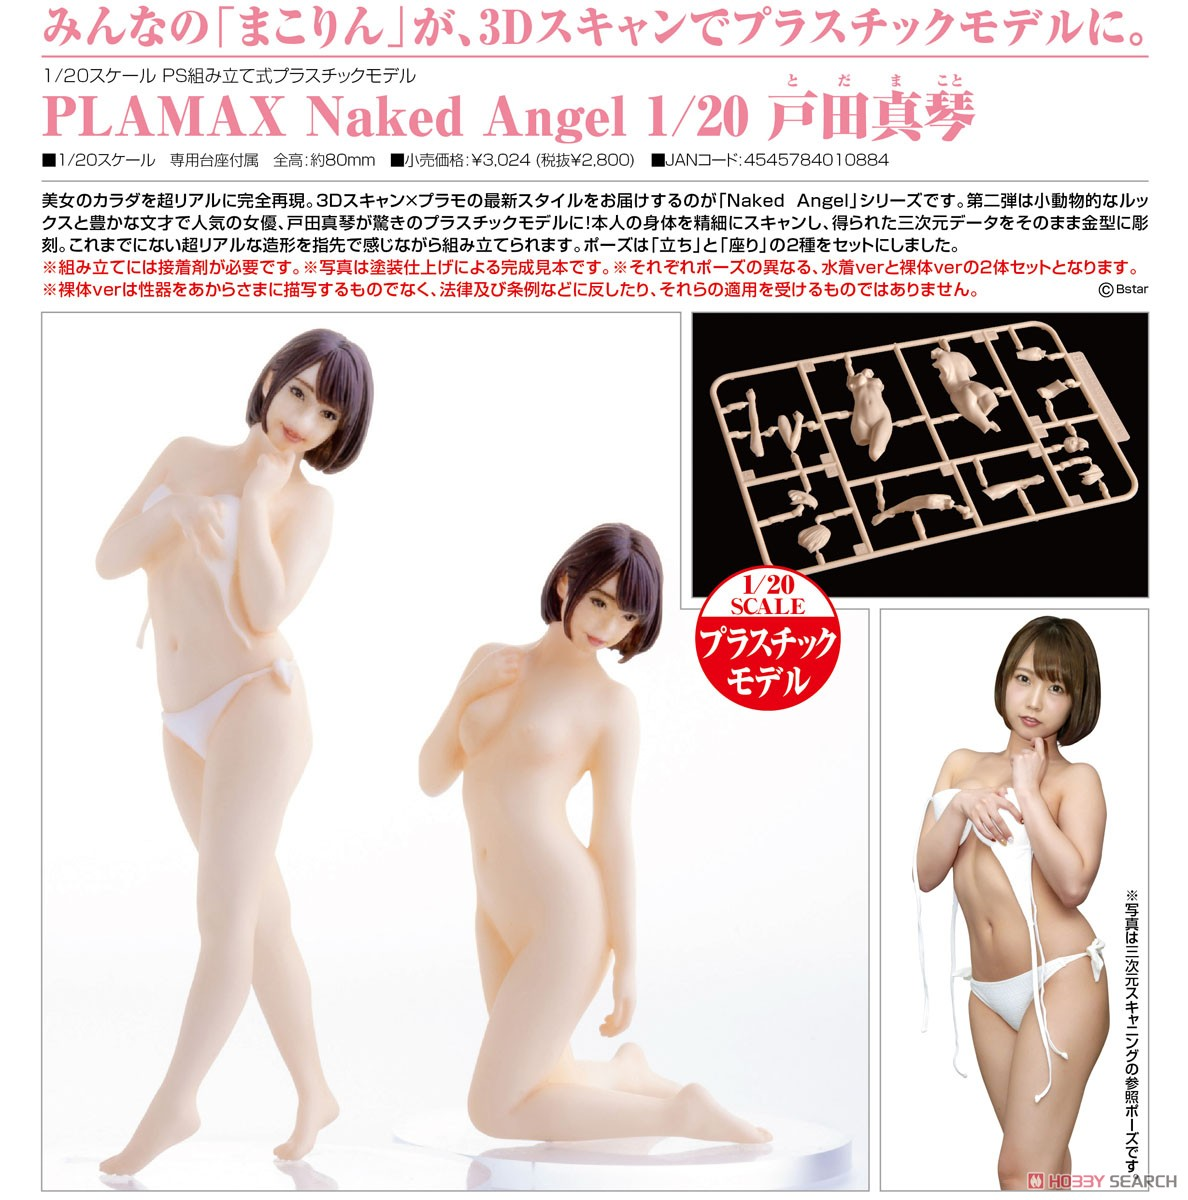 PLAMAX Naked Angel『戸田真琴』1/20 プラモデル-005